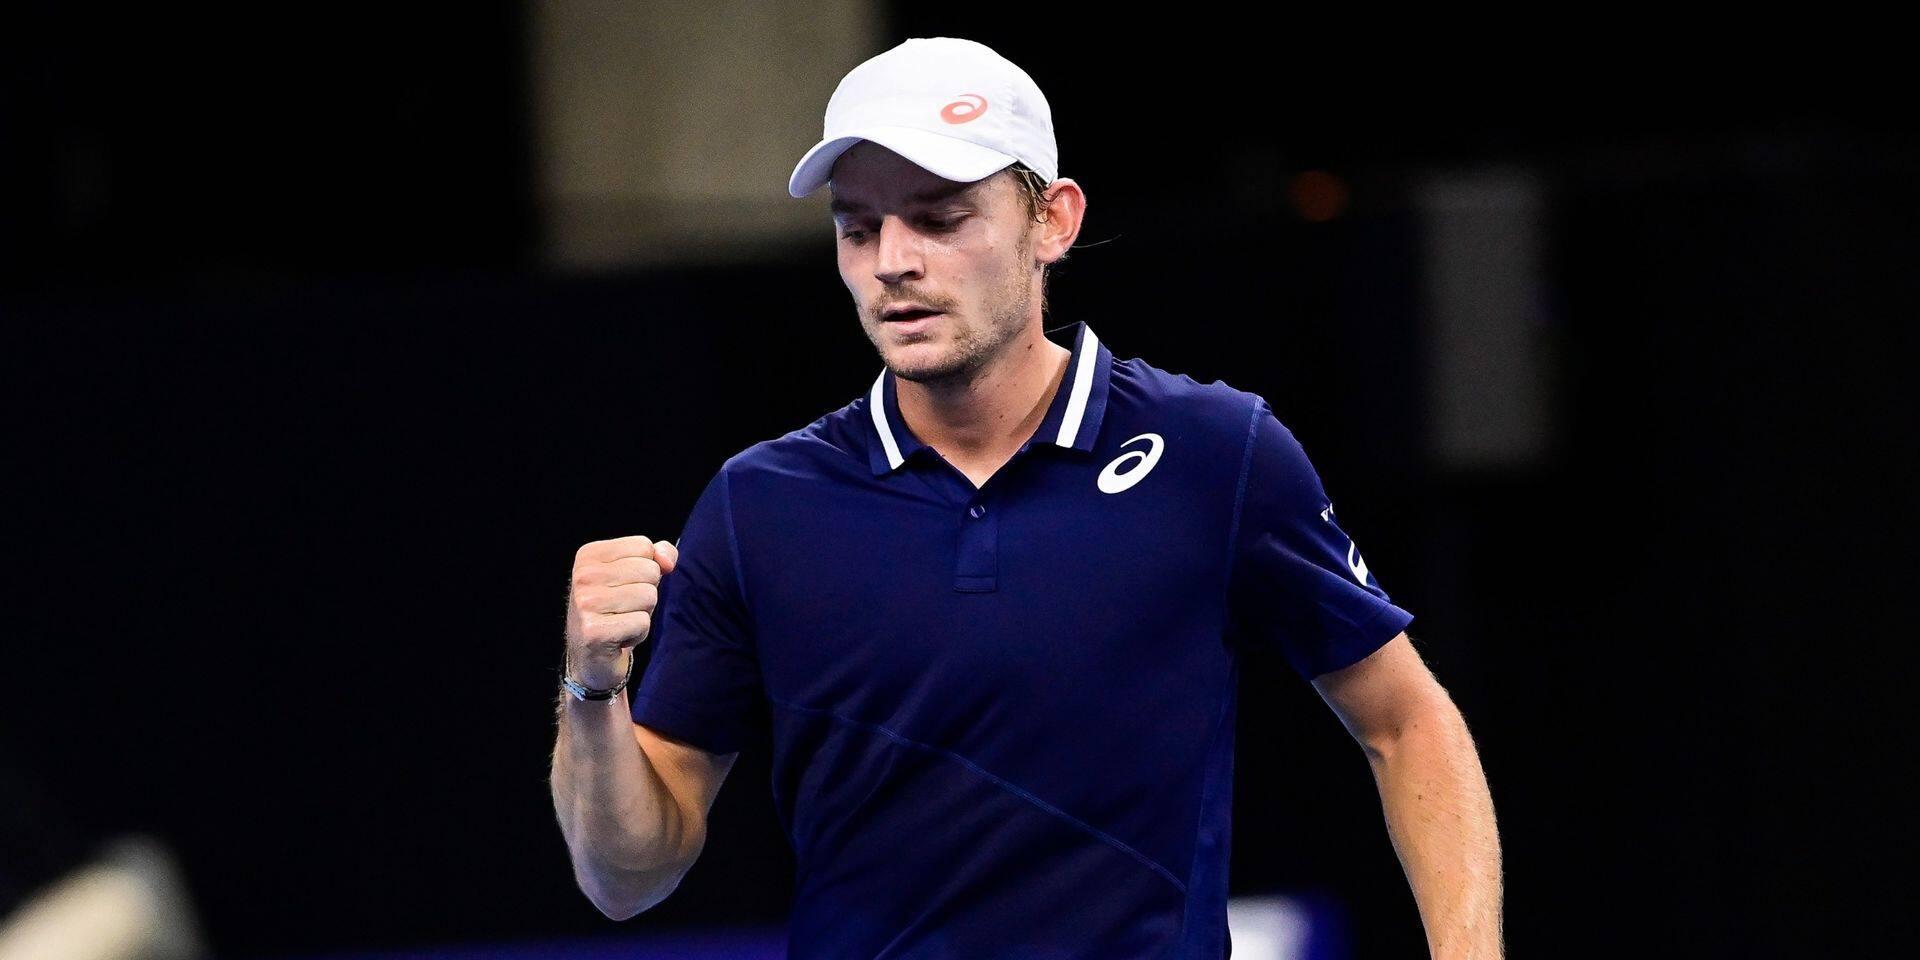 ATP Antalya: David Goffin, expéditif face à Stefano Travaglia, file en demi-finale